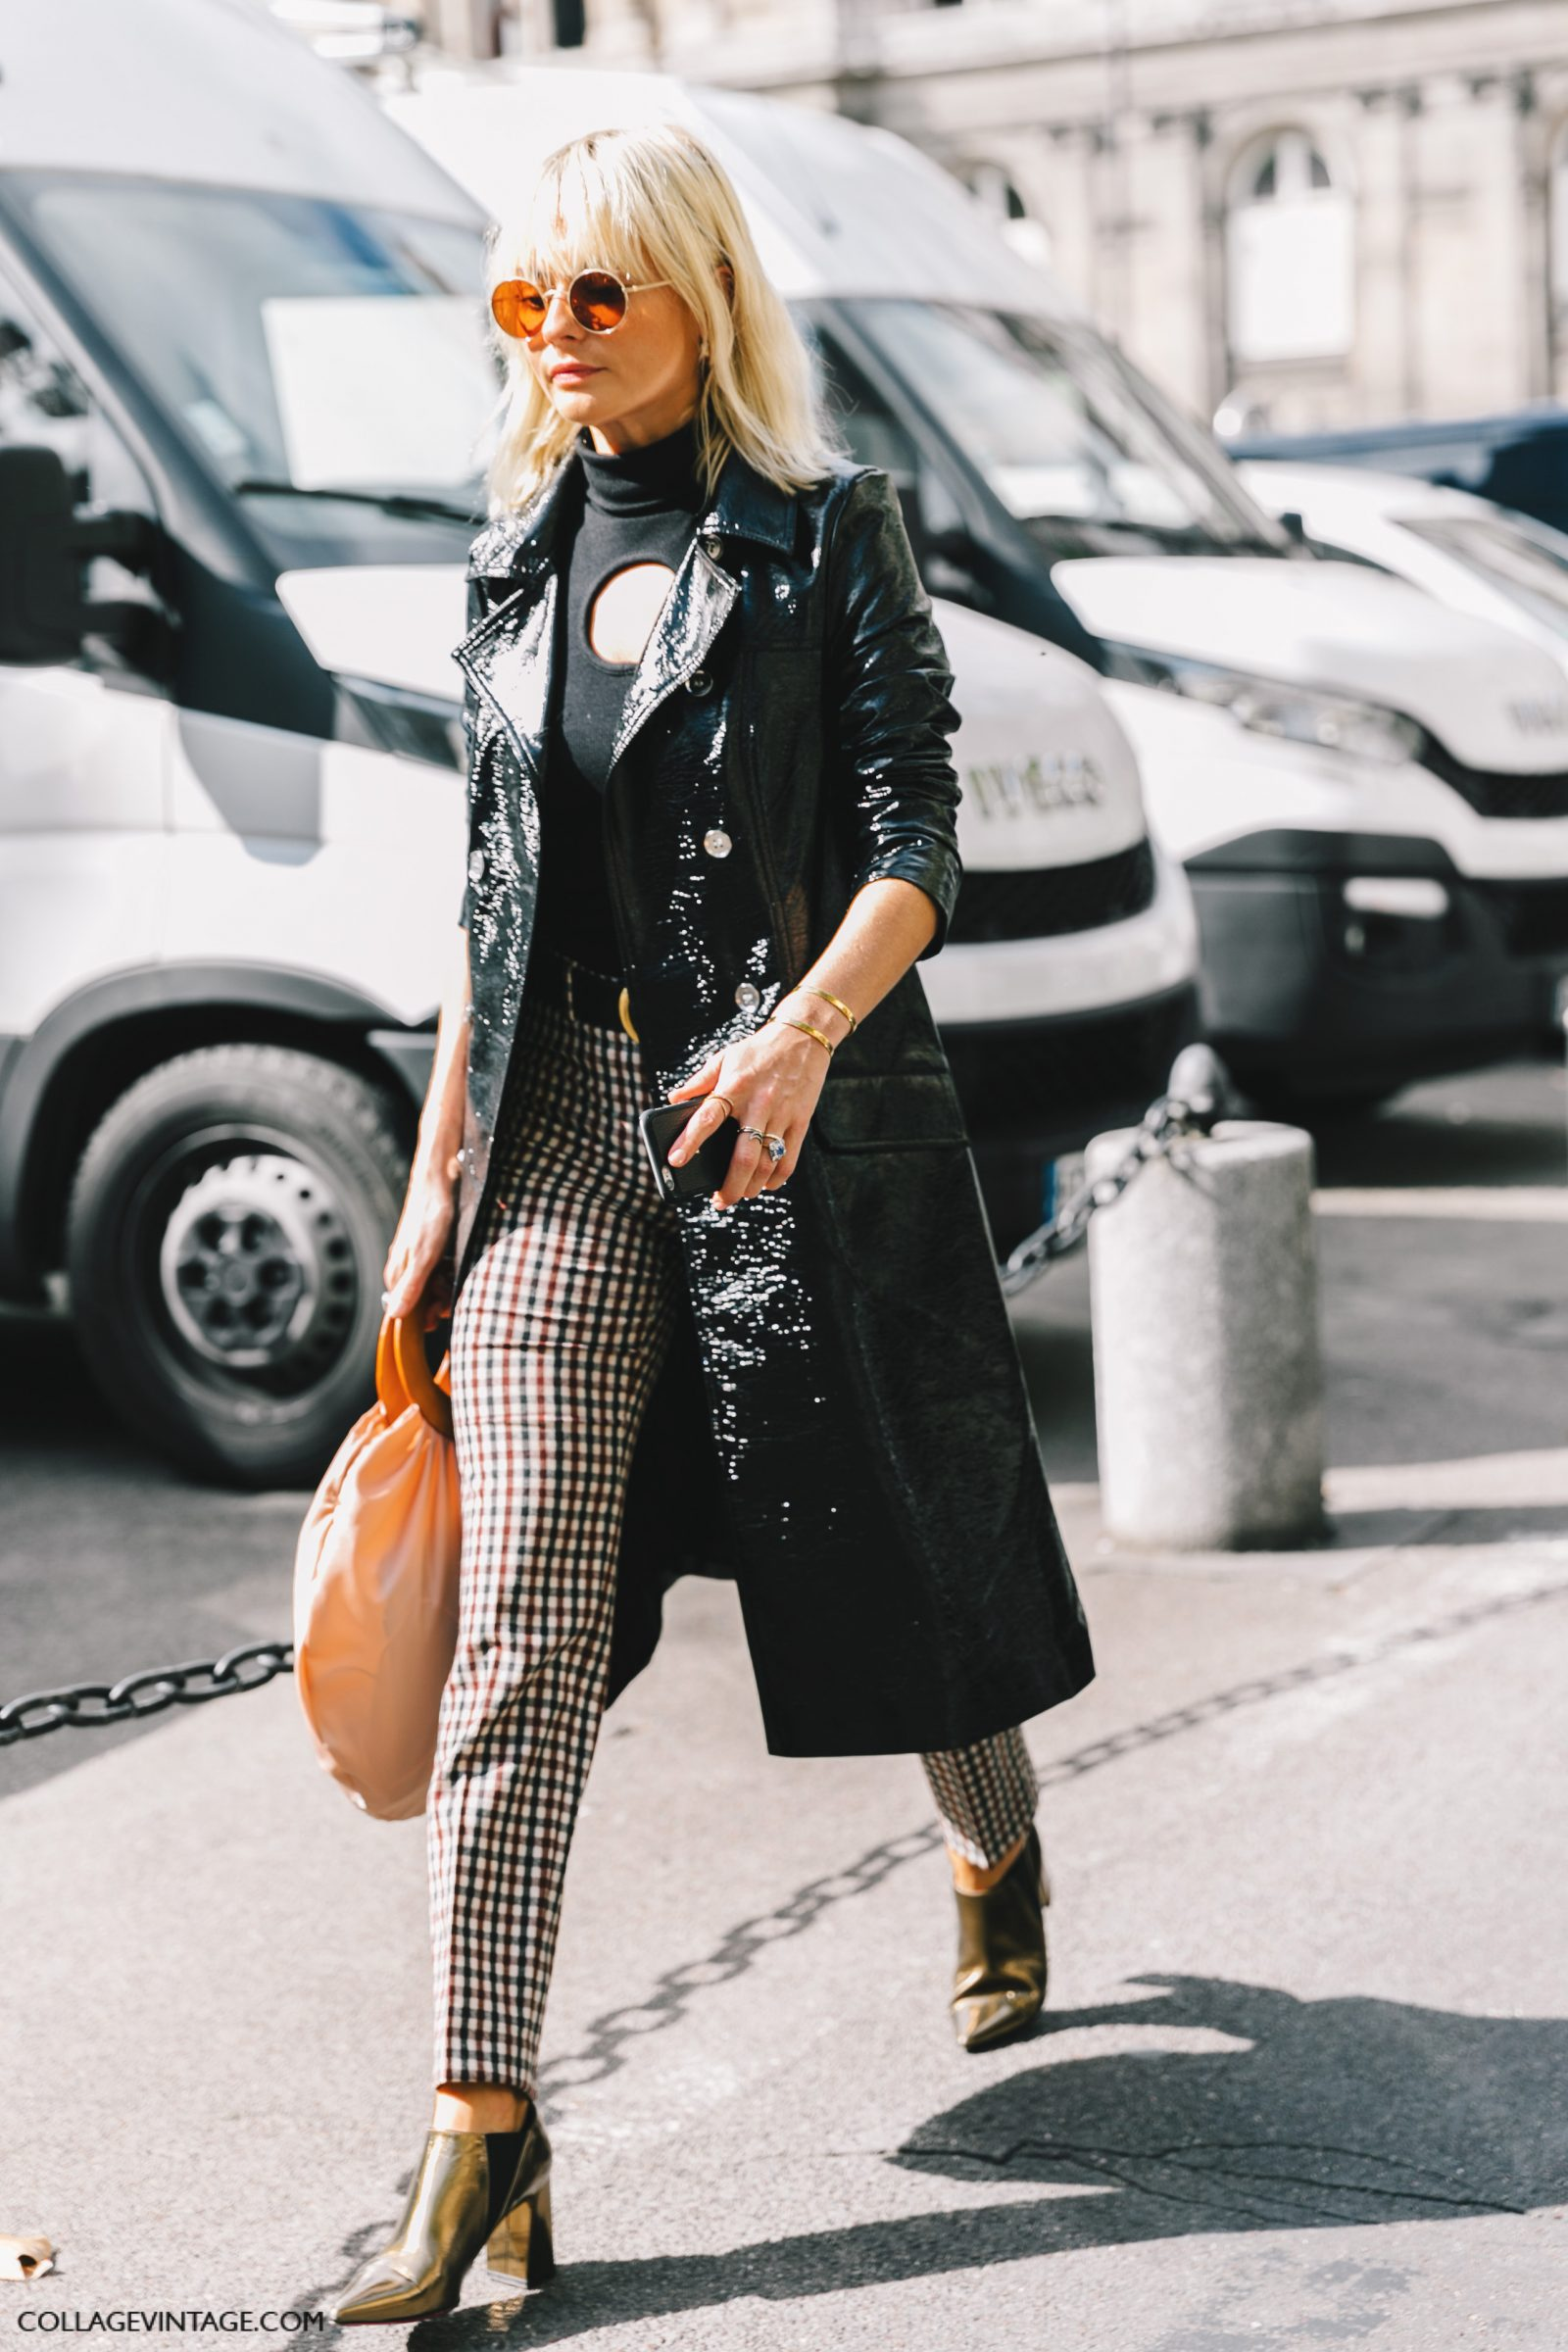 pfw-paris_fashion_week_ss17-street_style-outfits-collage_vintage-rochas-courreges-dries_van_noten-lanvin-guy_laroche-115